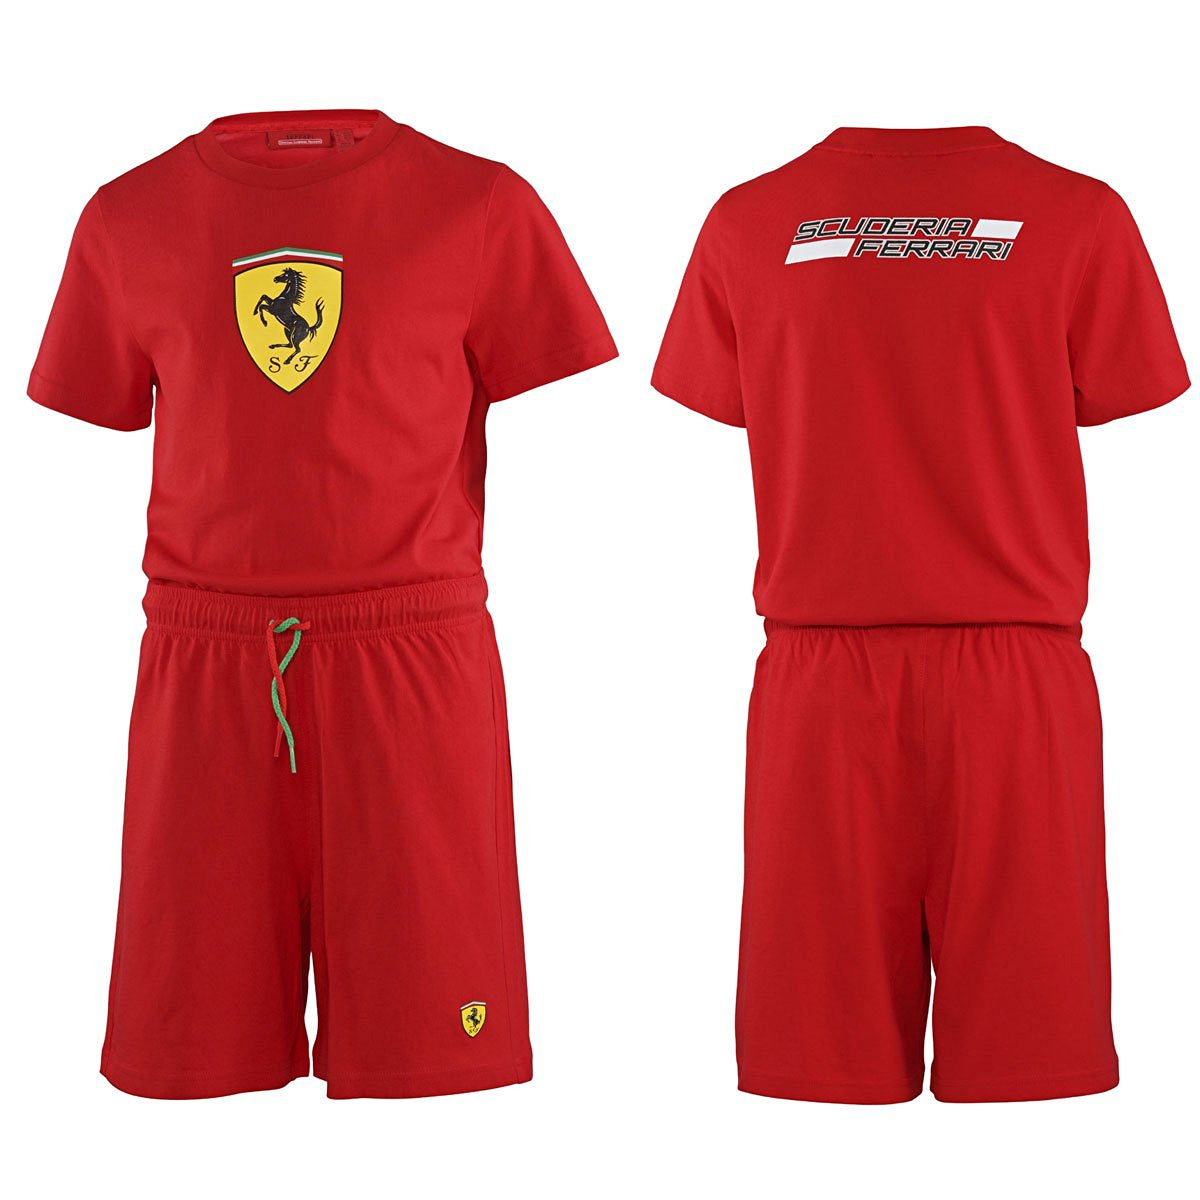 b7477a0f Cheap T Shirt Ferrari, find T Shirt Ferrari deals on line at Alibaba.com